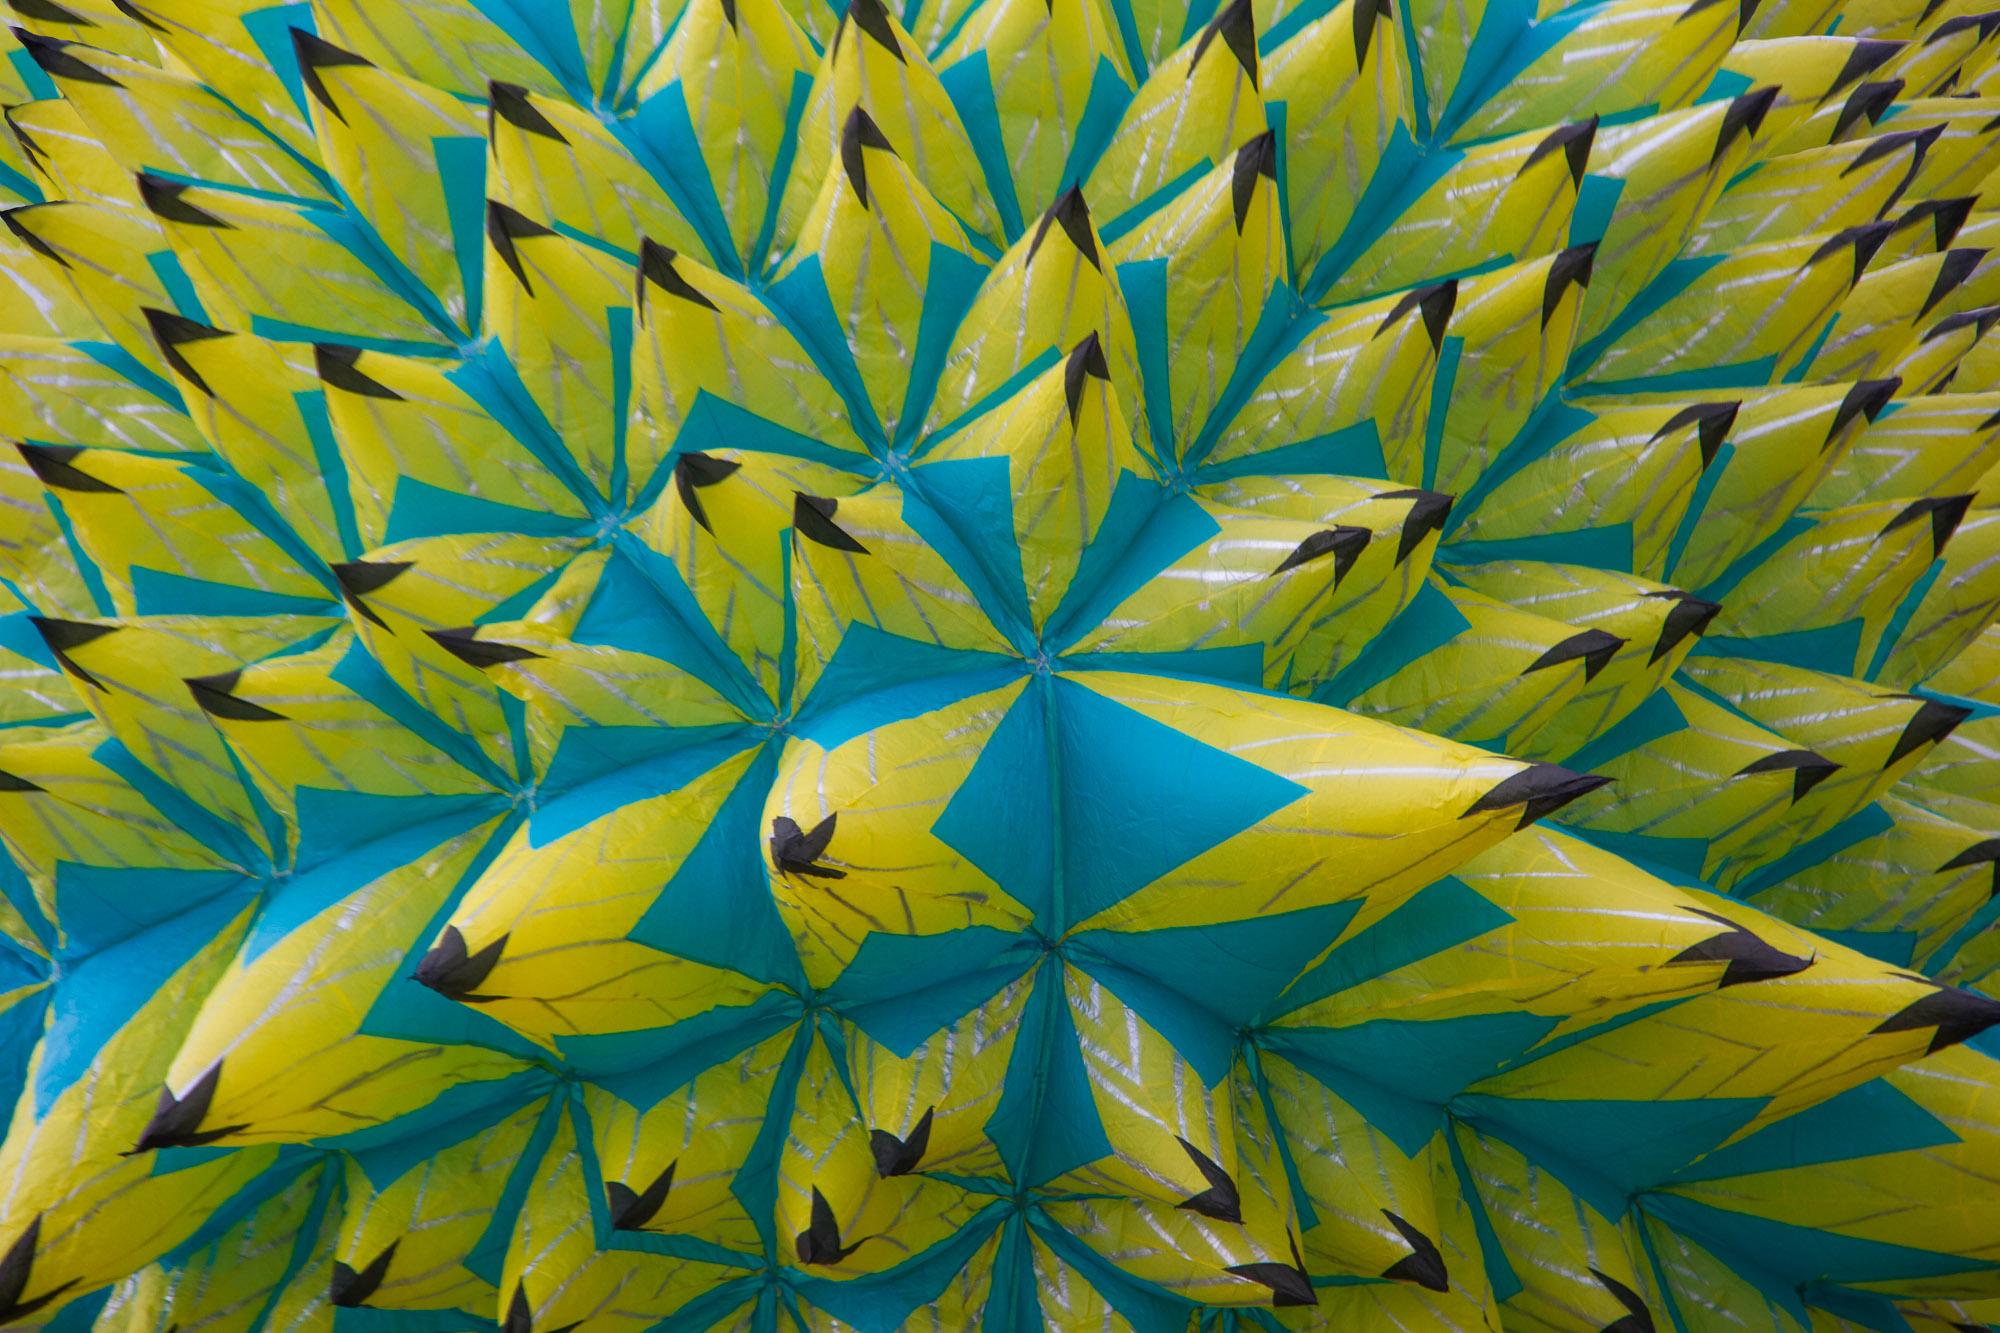 Porcupine   CantoyaFest: Pátzcuaro, Michoacán, Mexico — Sunday, July 23, 2017